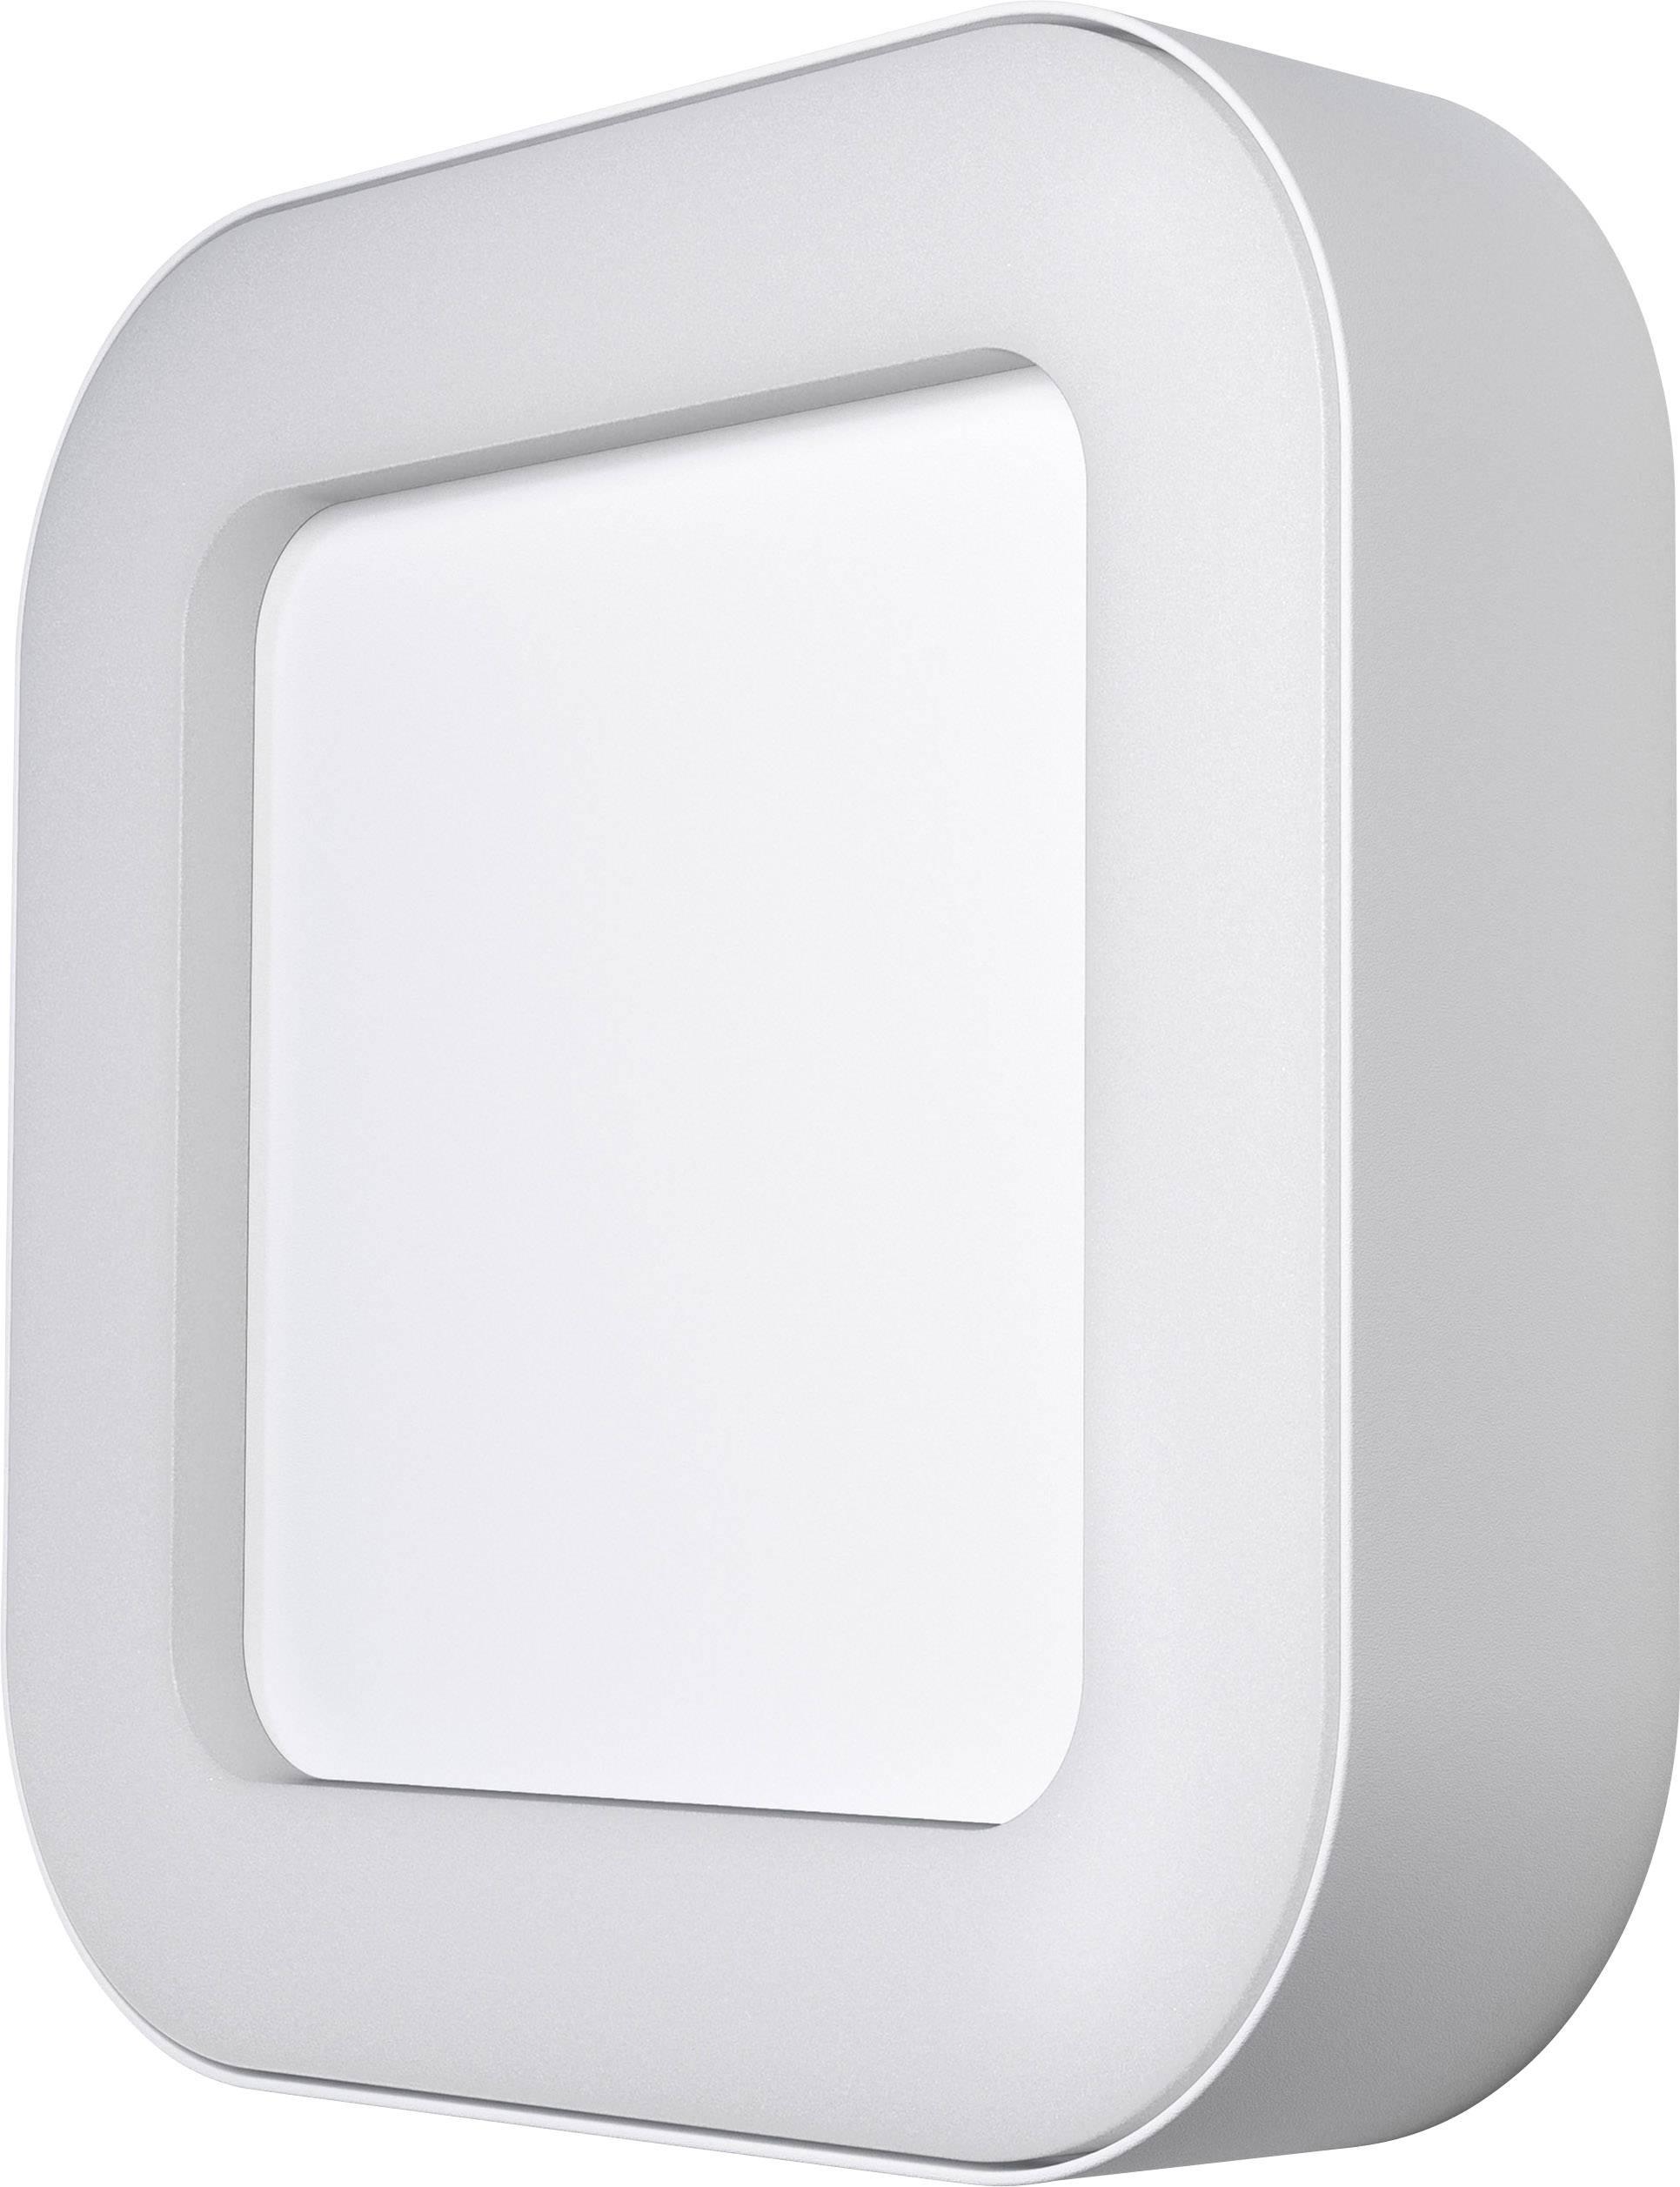 LEDVANCE Endura® Style Square 4058075031722 Lampada da parete per esterni a LED Classe energetica: LED (A++ - E) 13 W